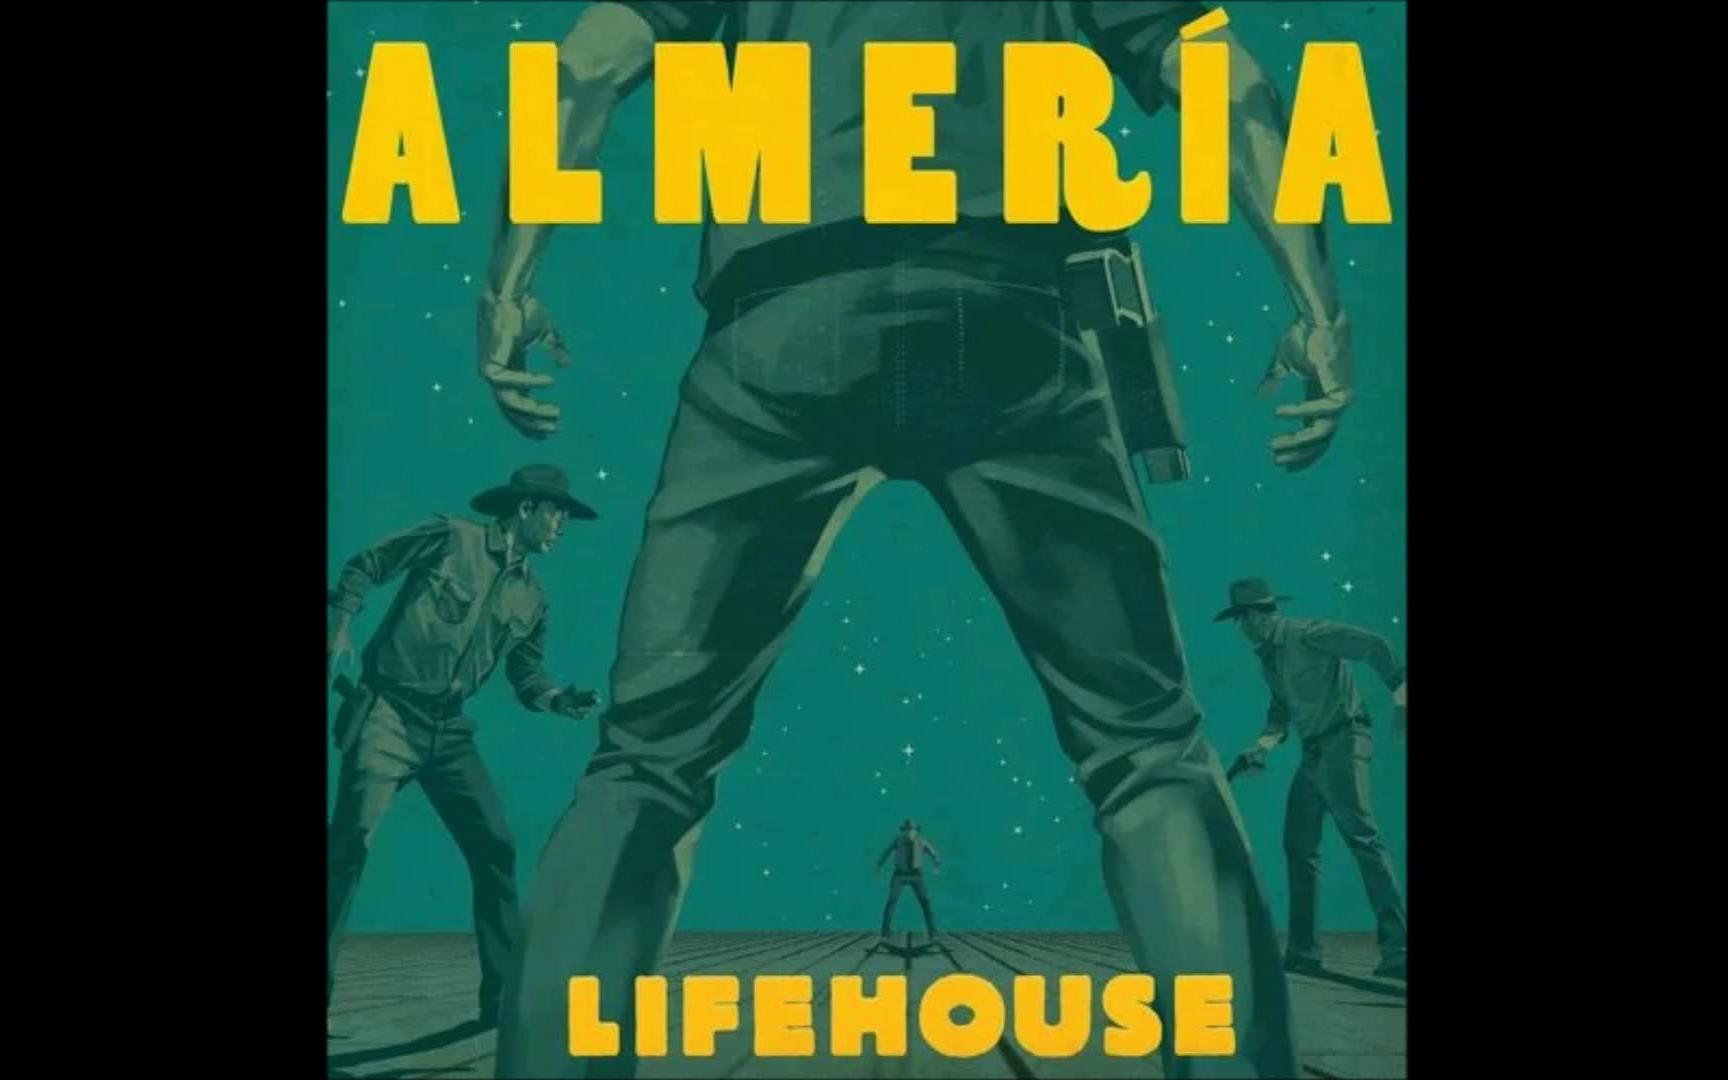 ��ŷ��С�ڡ�Aftermath-Lifehouse